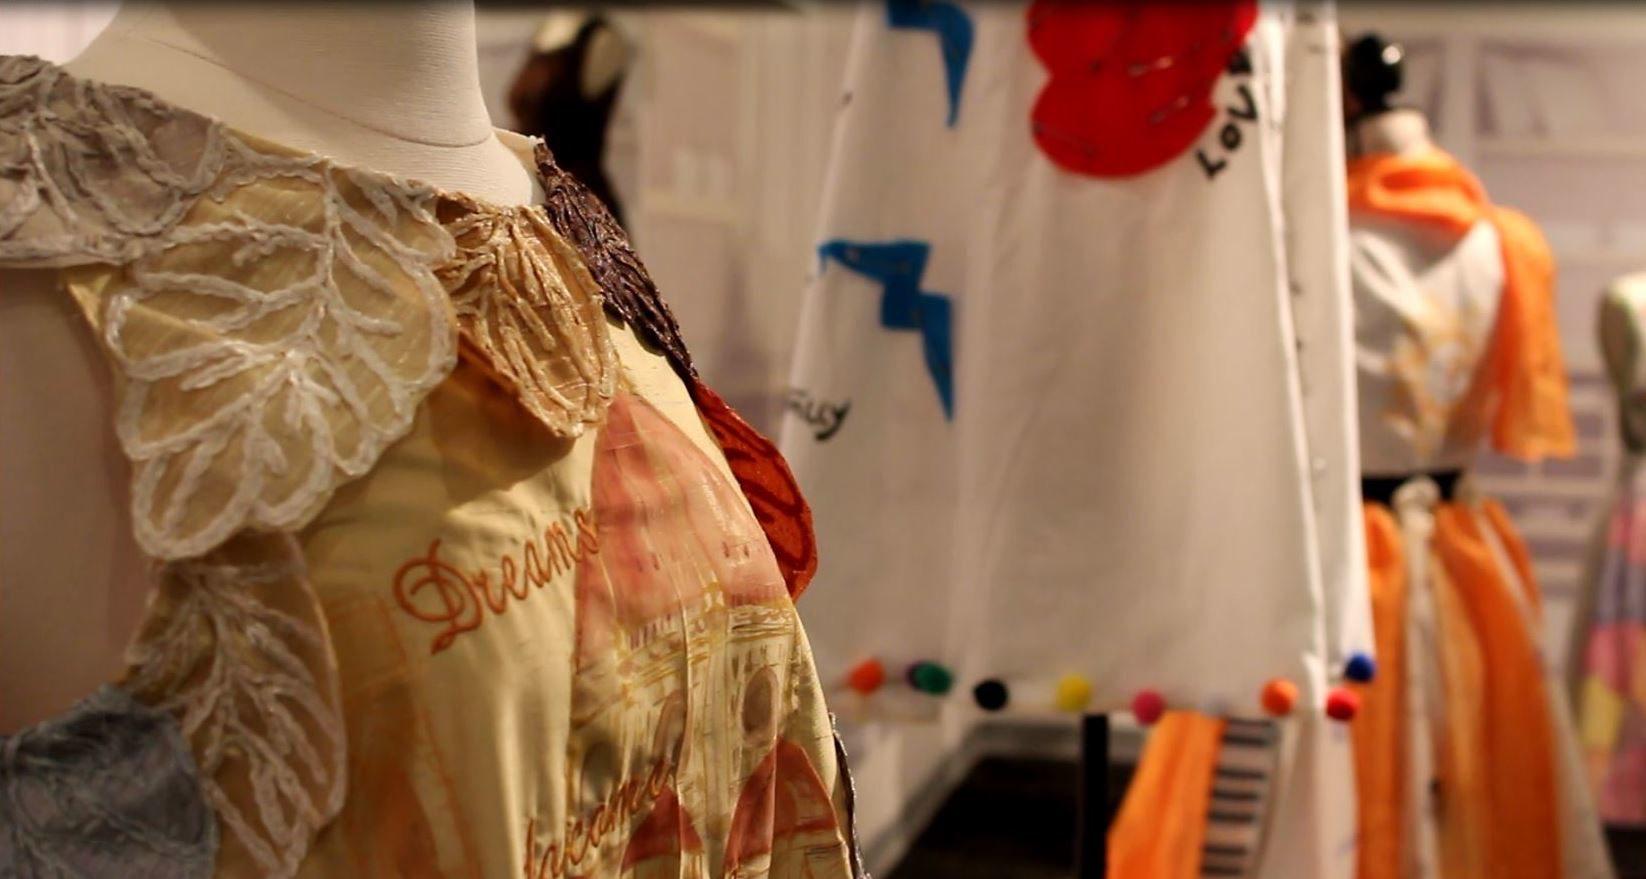 Exhibiting lives through the art of fashion design